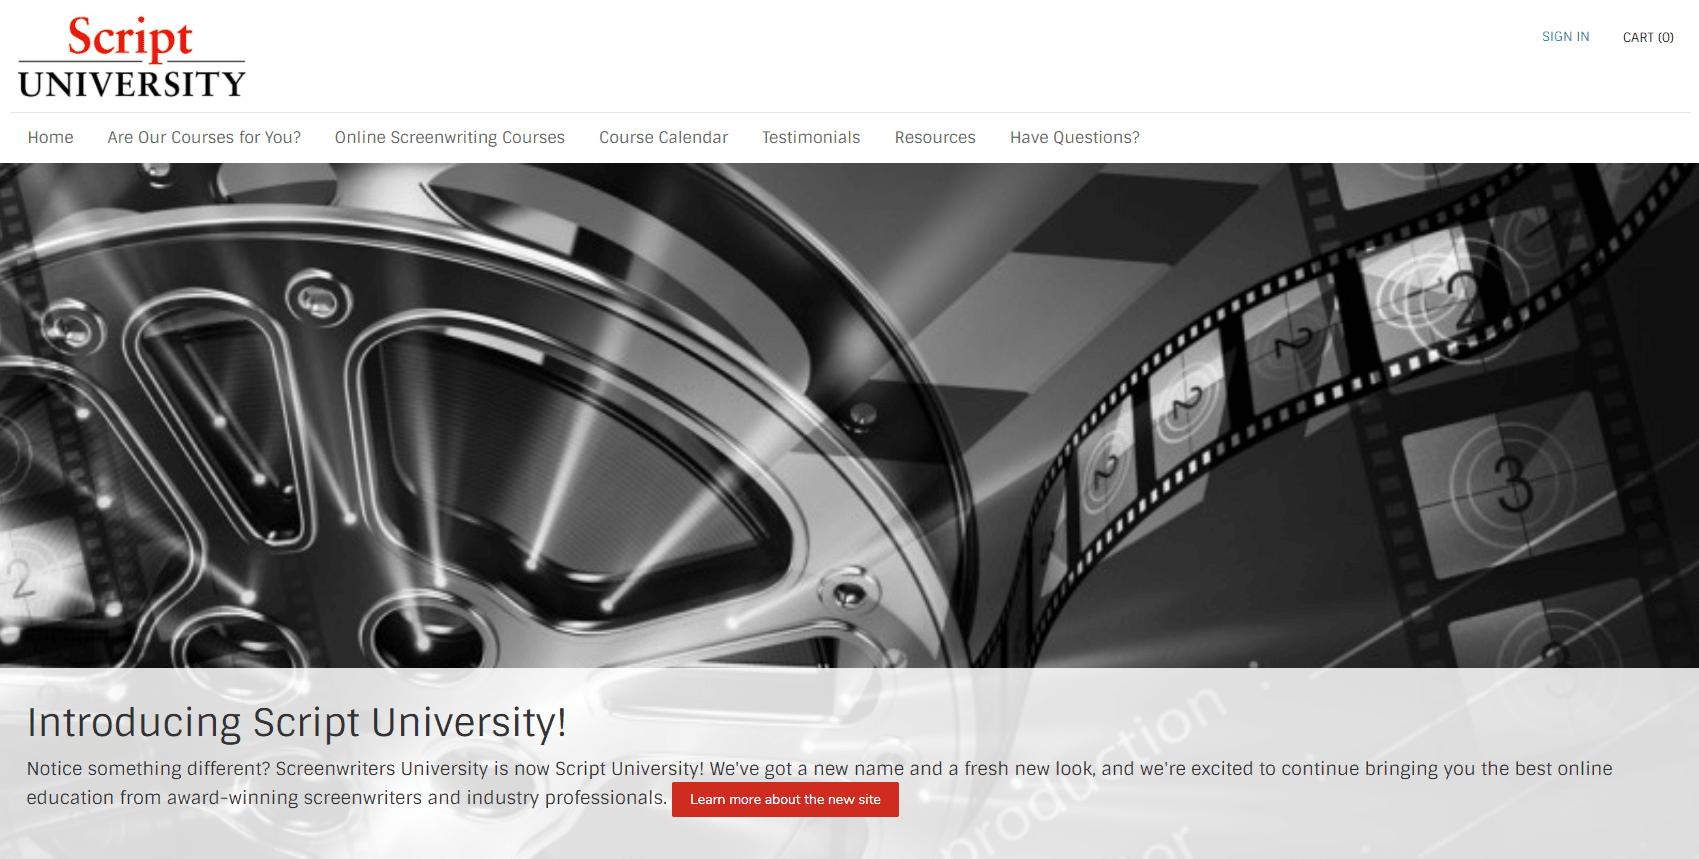 Script University Home Page screenshot